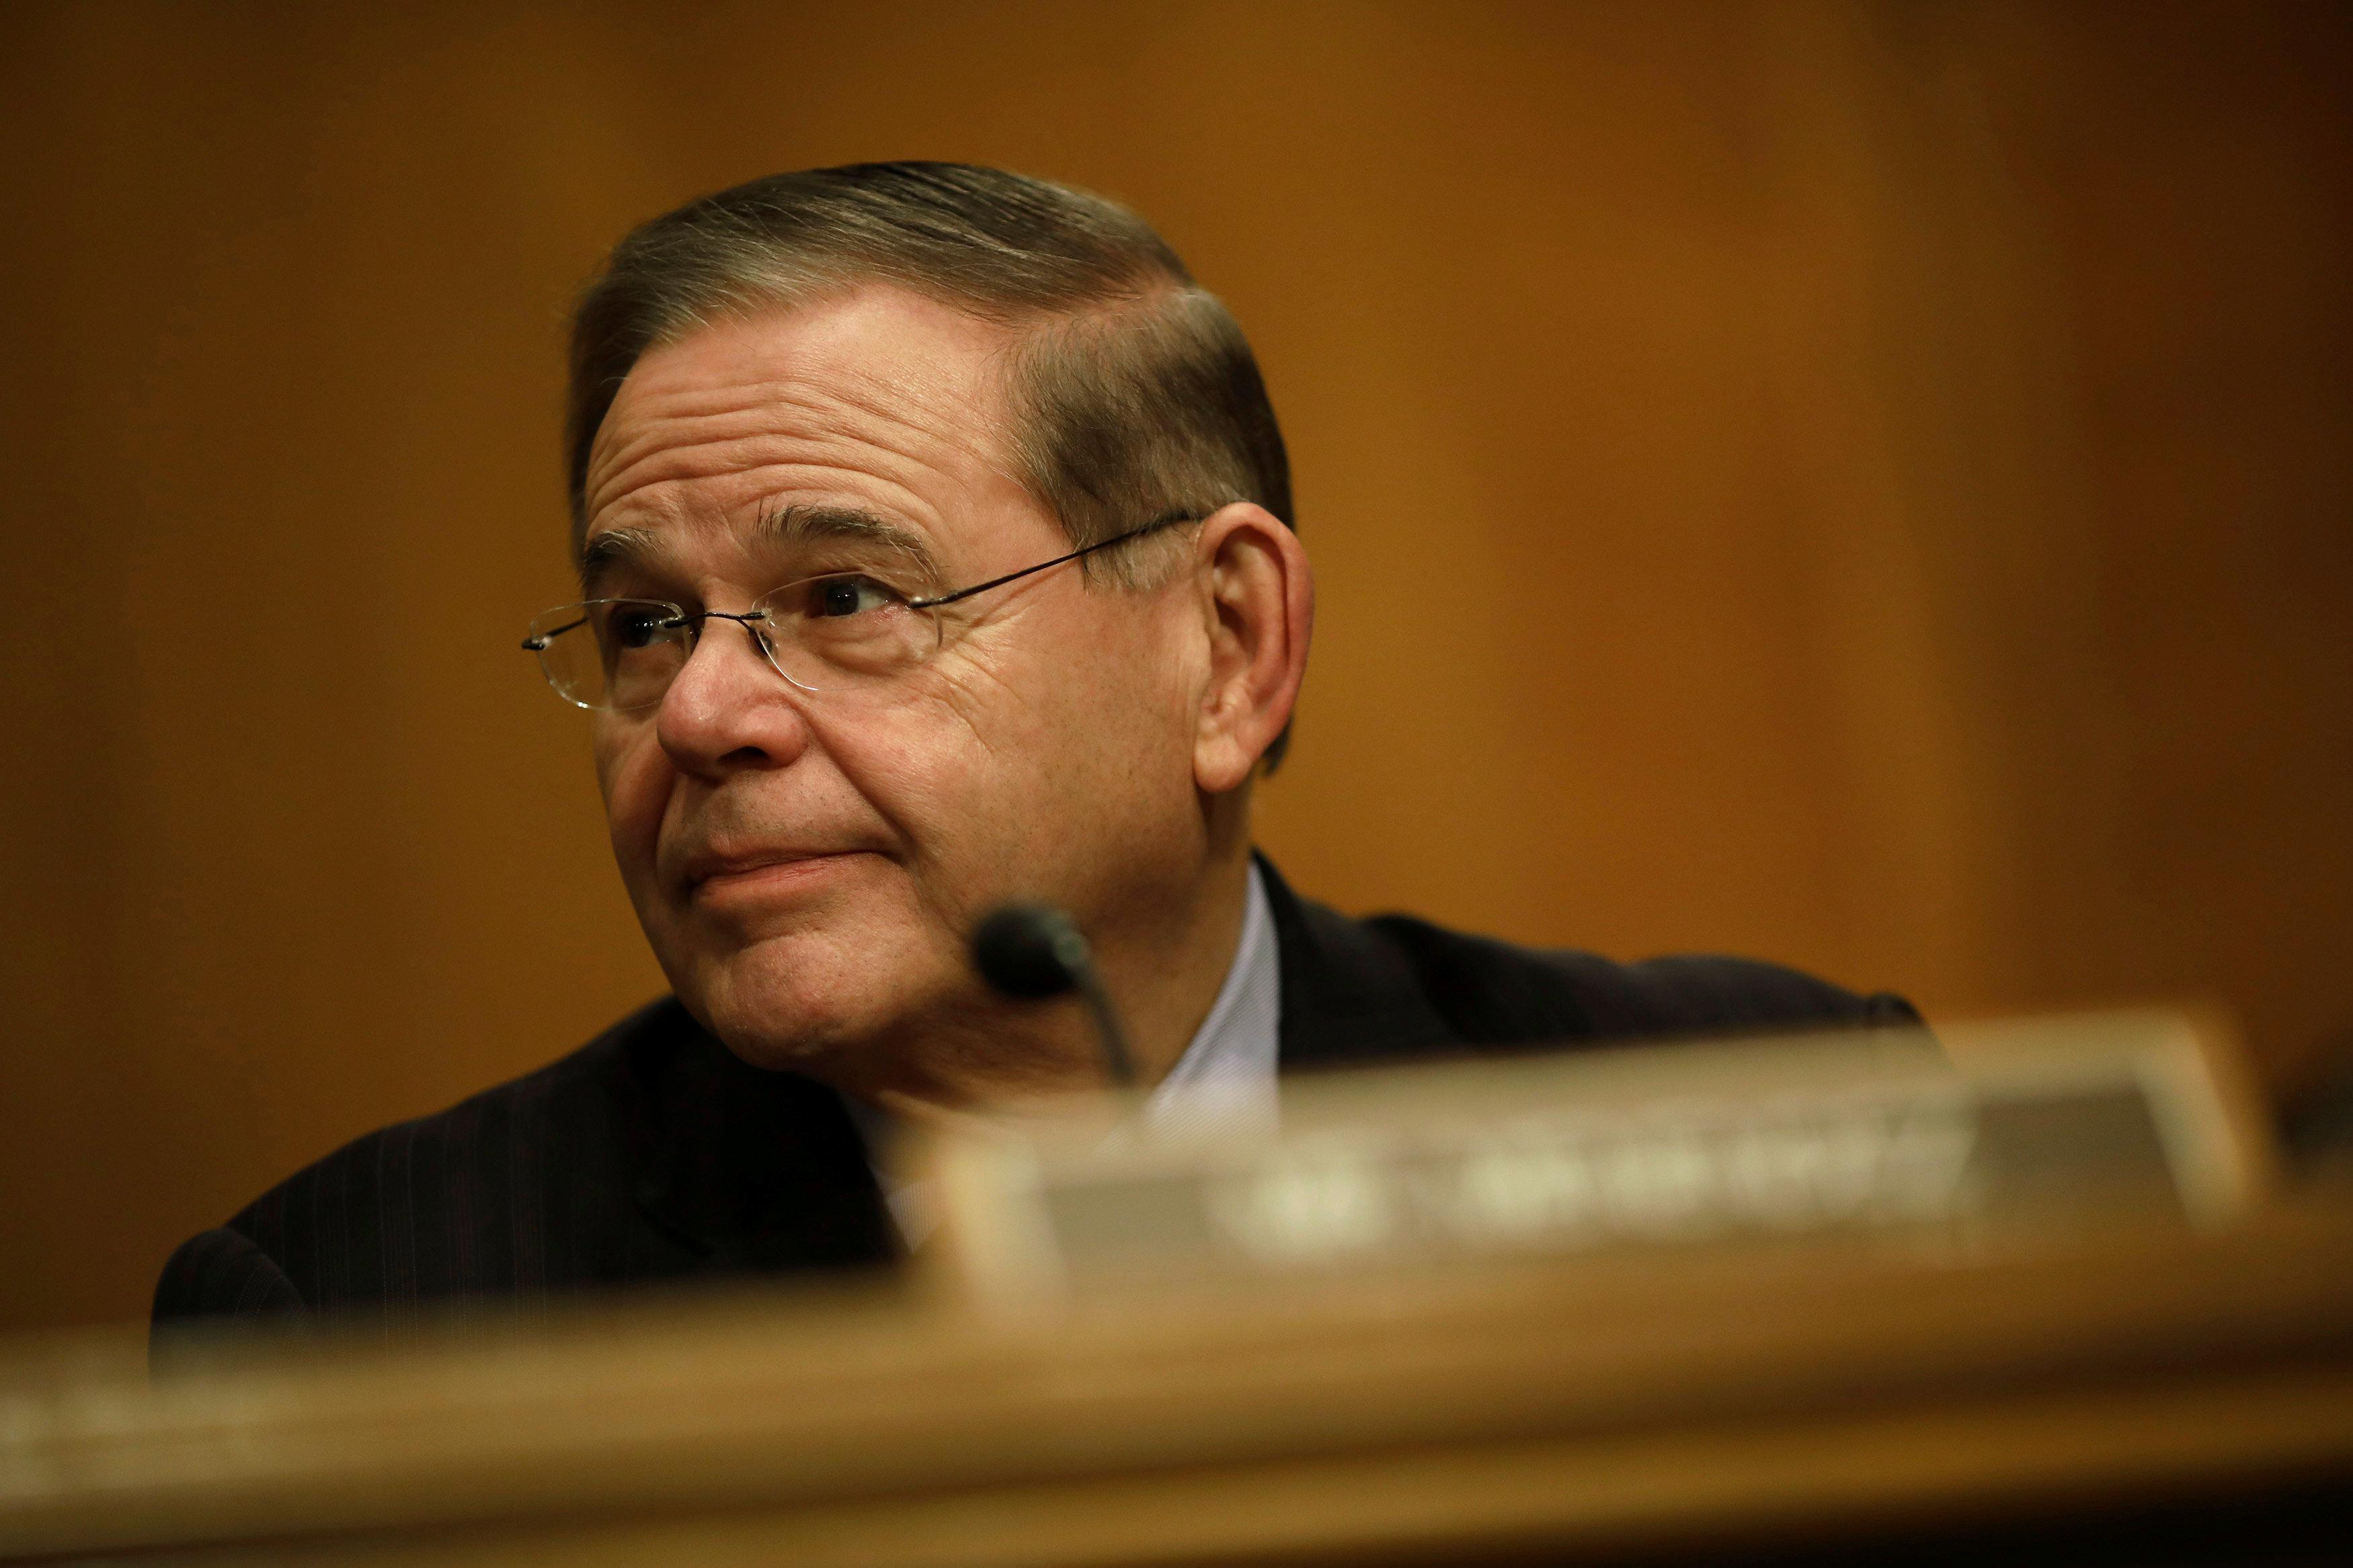 Sen. Bob Menendez (D-NJ) looks on during a Senate Banking Committee hearing on Capitol Hill in Washington, U.S. January 23, 2018. REUTERS/Aaron P. Bernstein